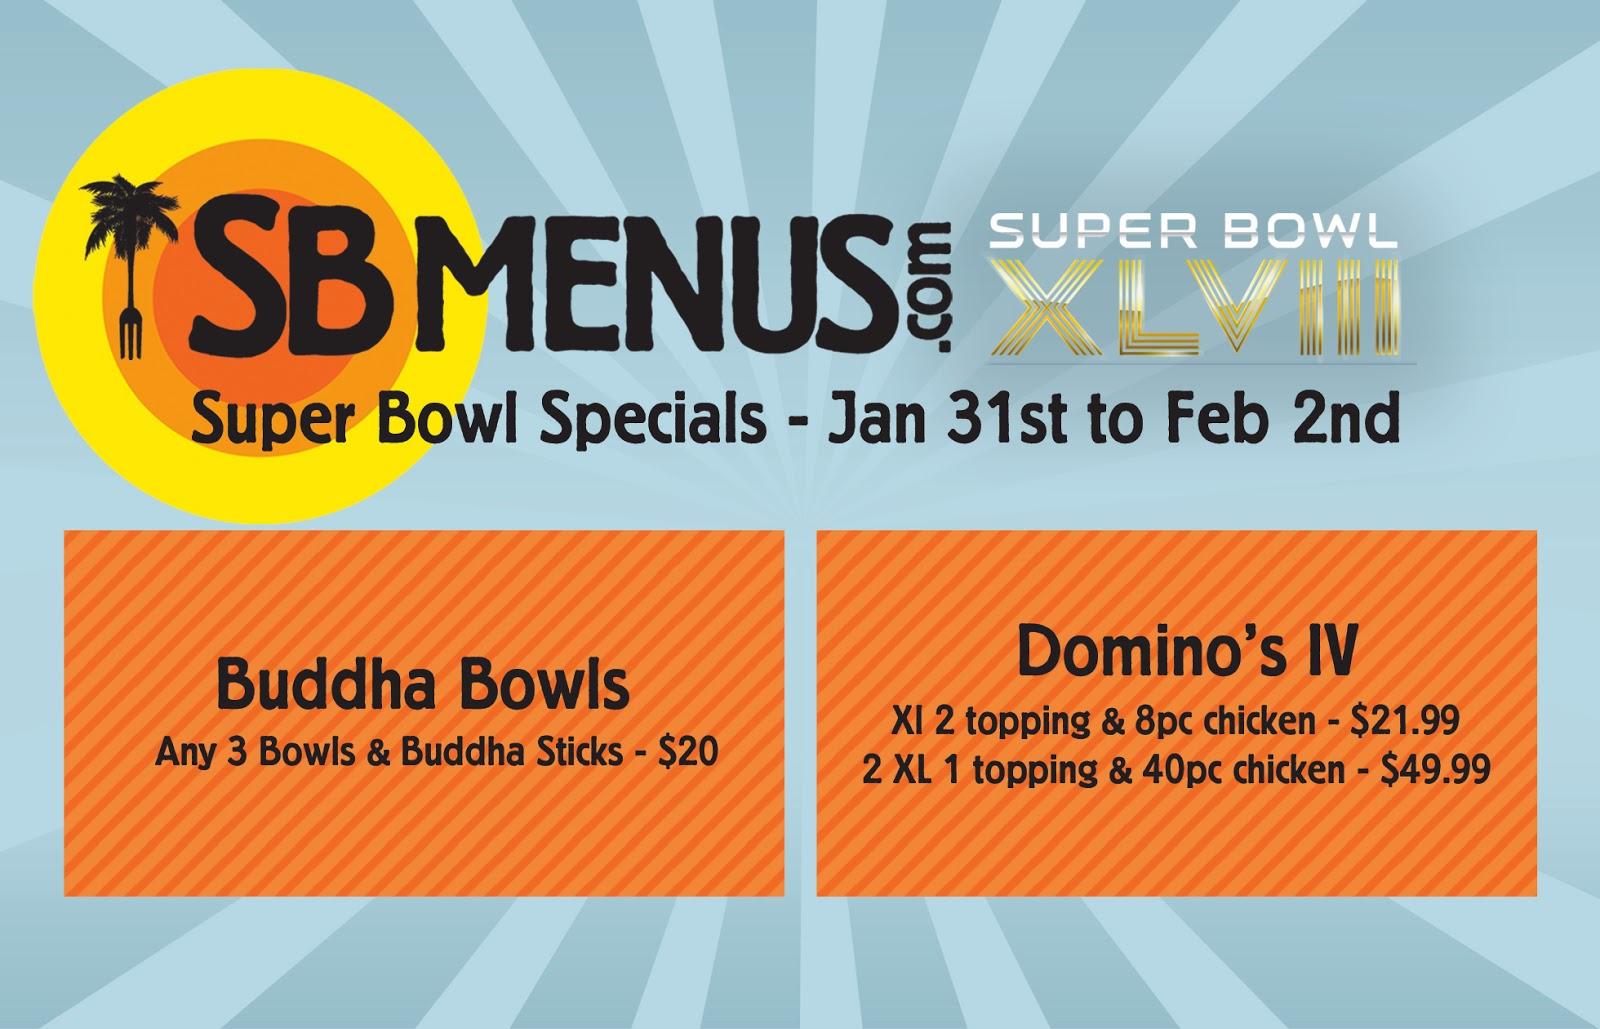 Super Bowl Weekend Specials